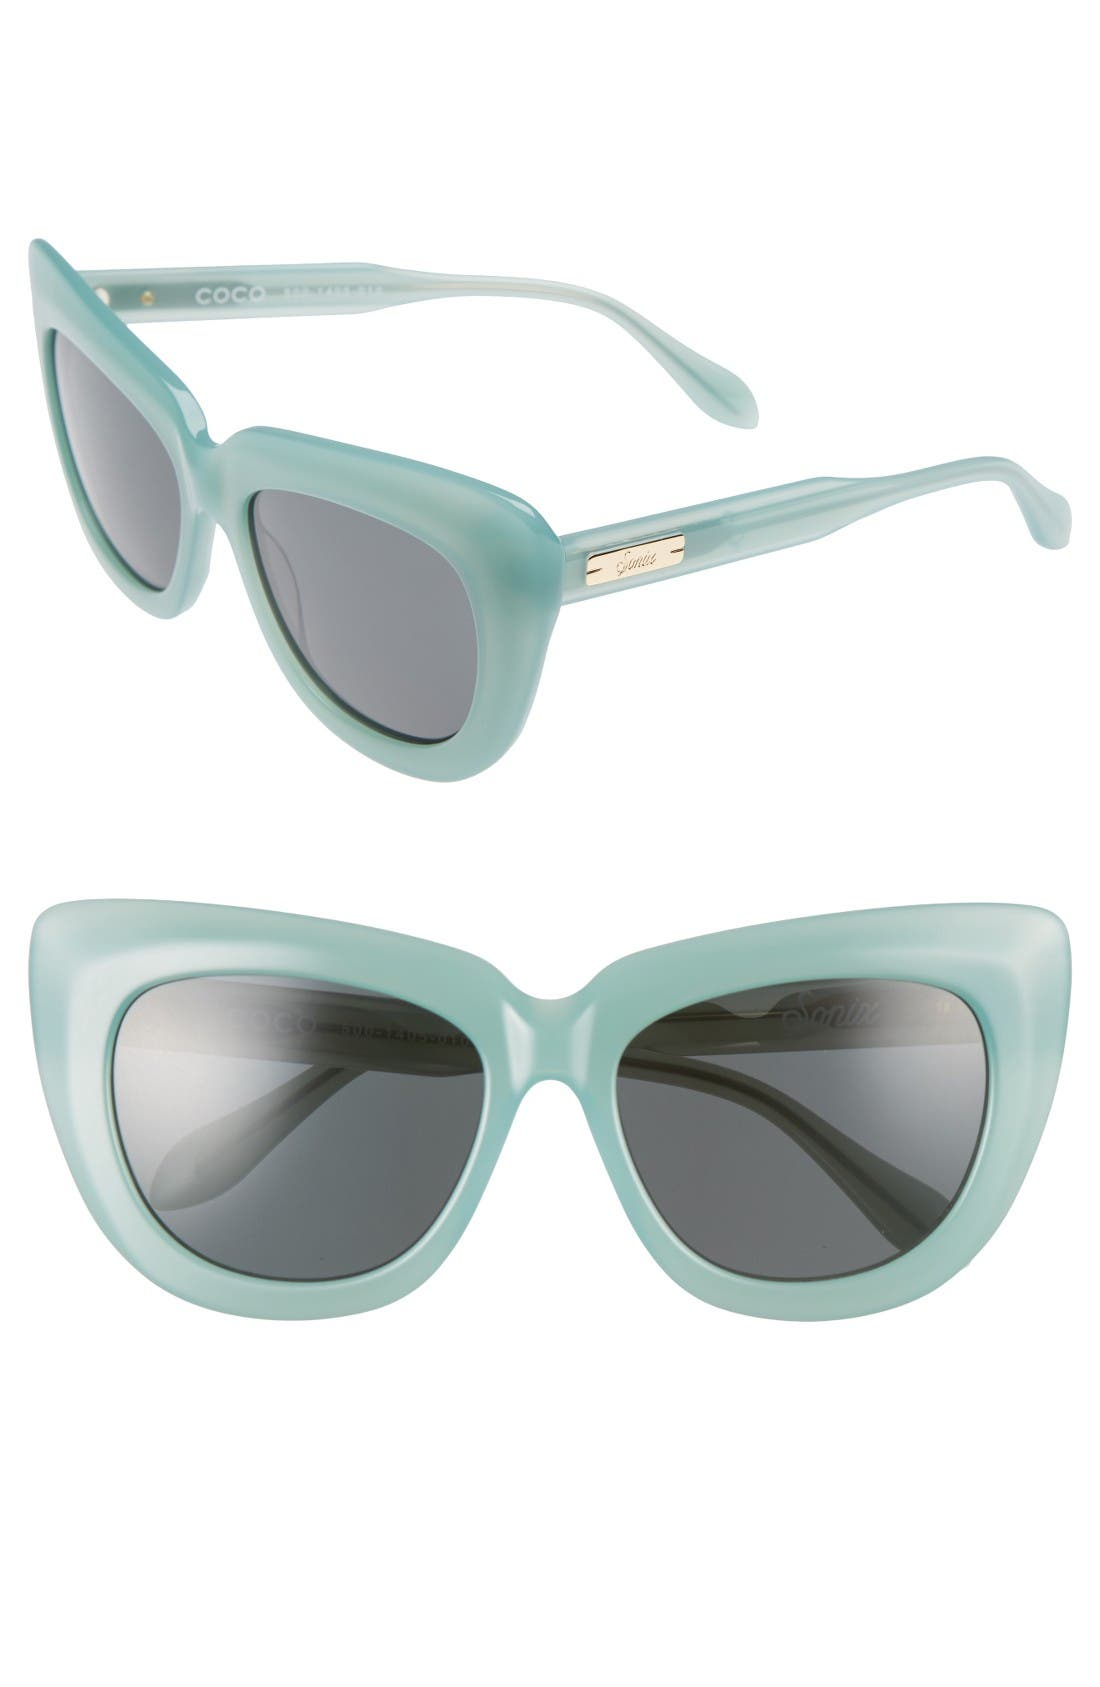 Sonix Coco 55mm Cat Eye Sunglasses